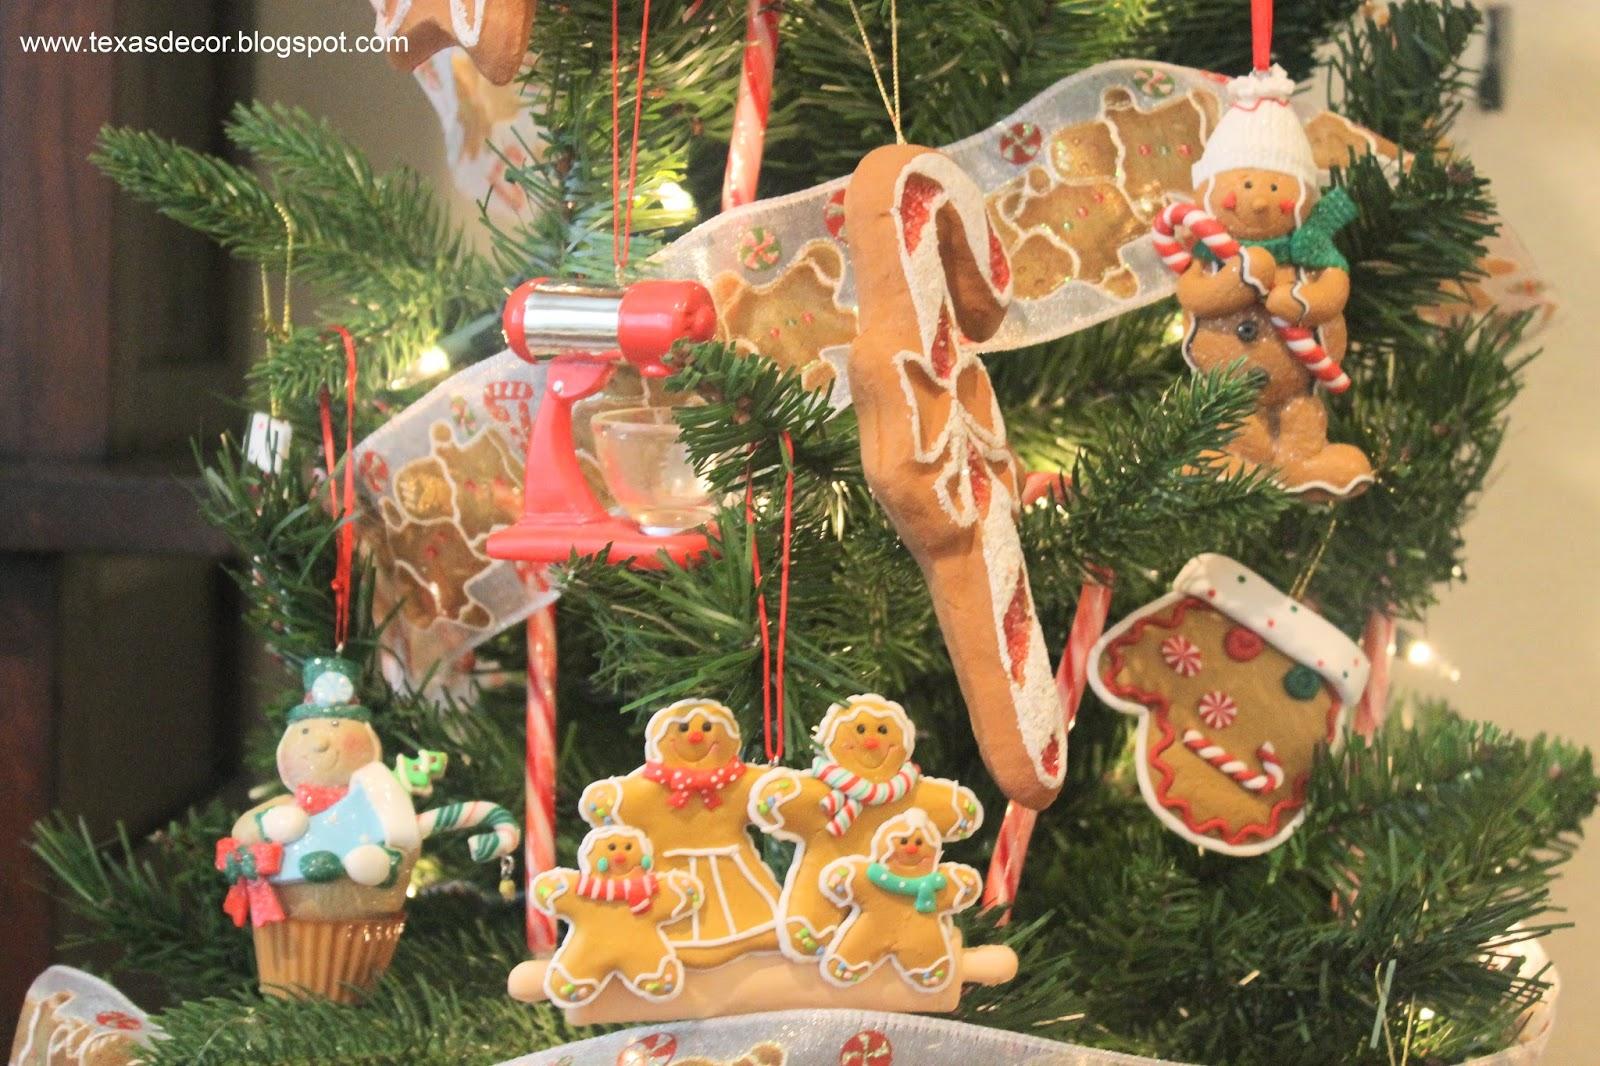 montgomery ward gingerbread ornaments